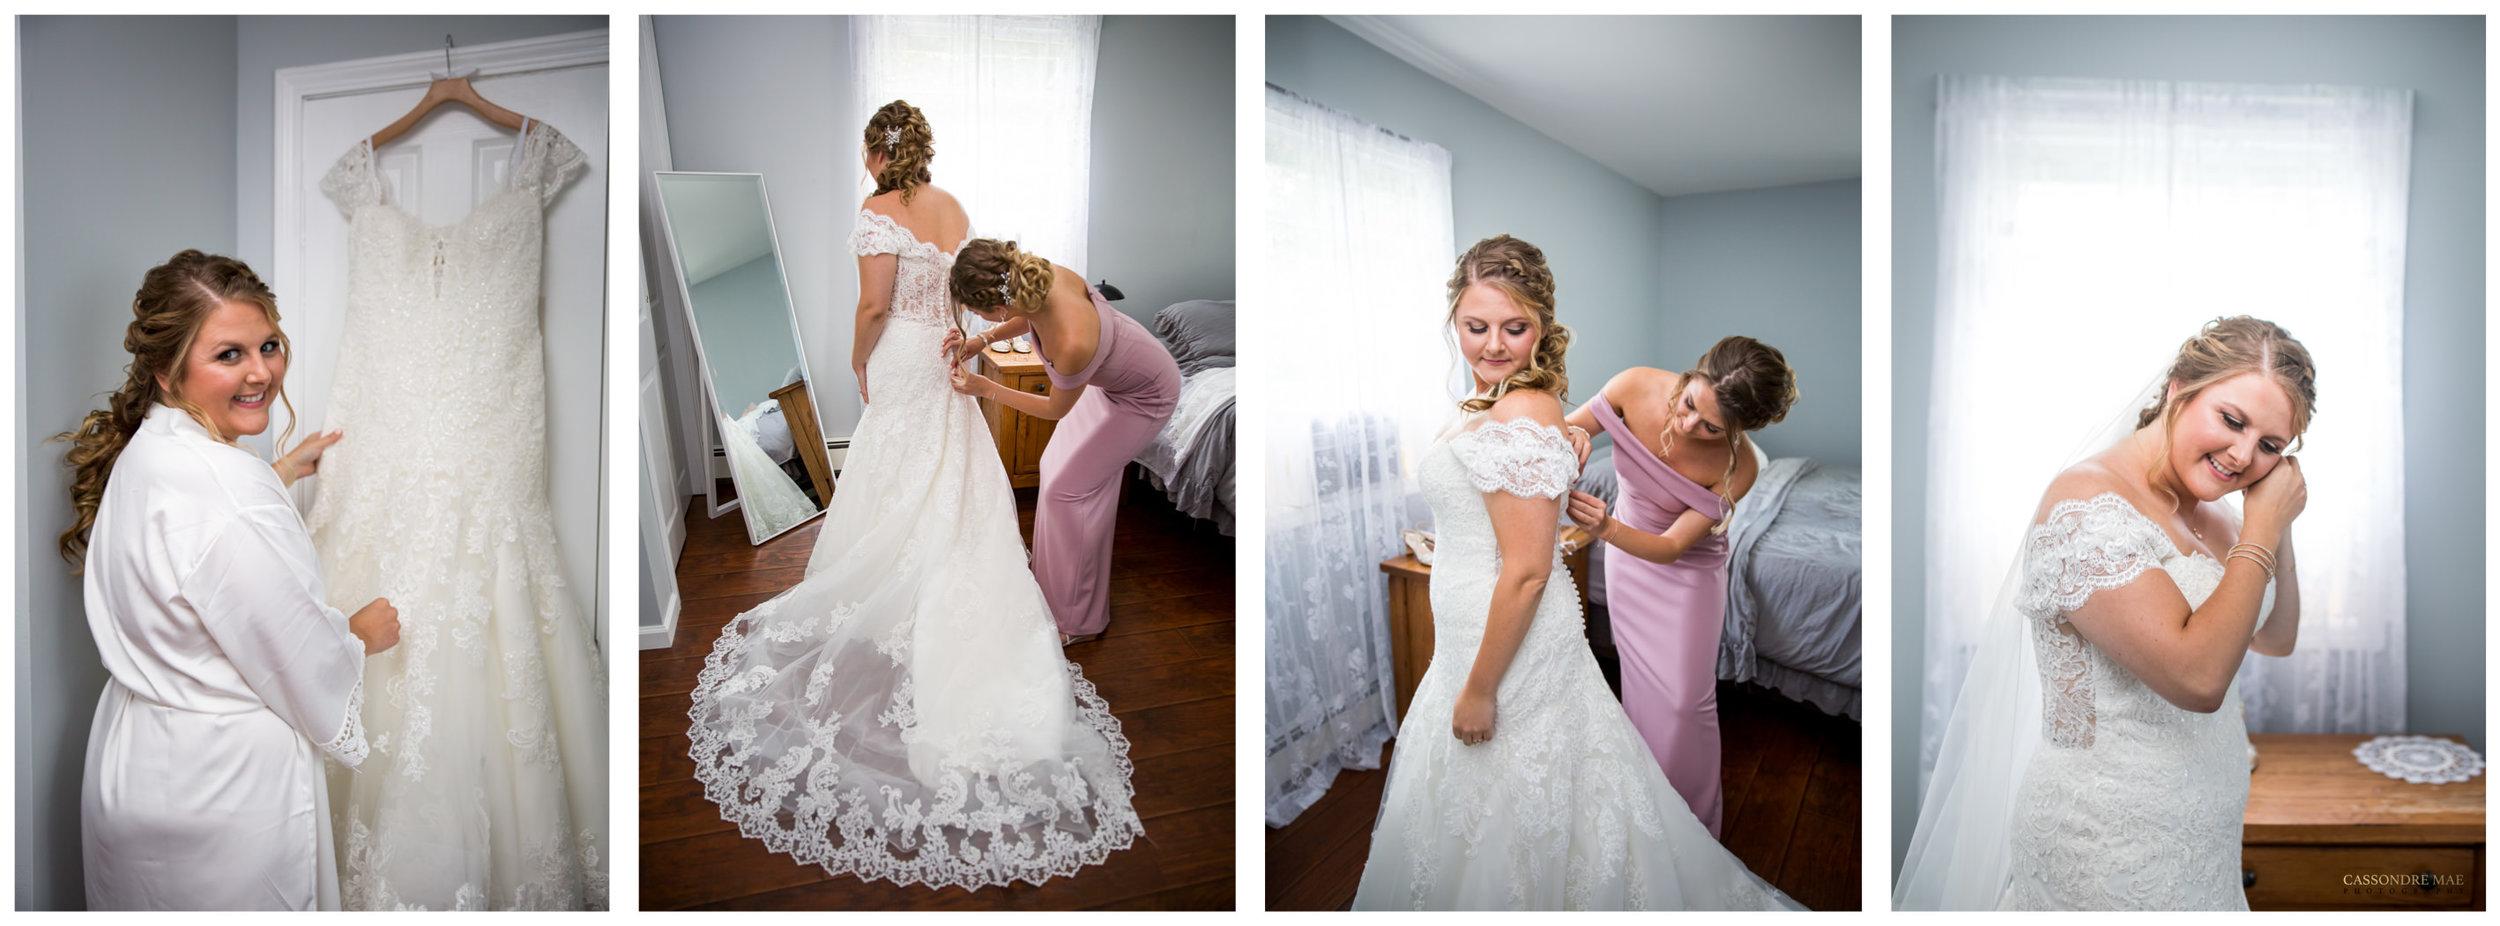 Cassondre Mae Photography The Links Wedding Photographer 8.jpg